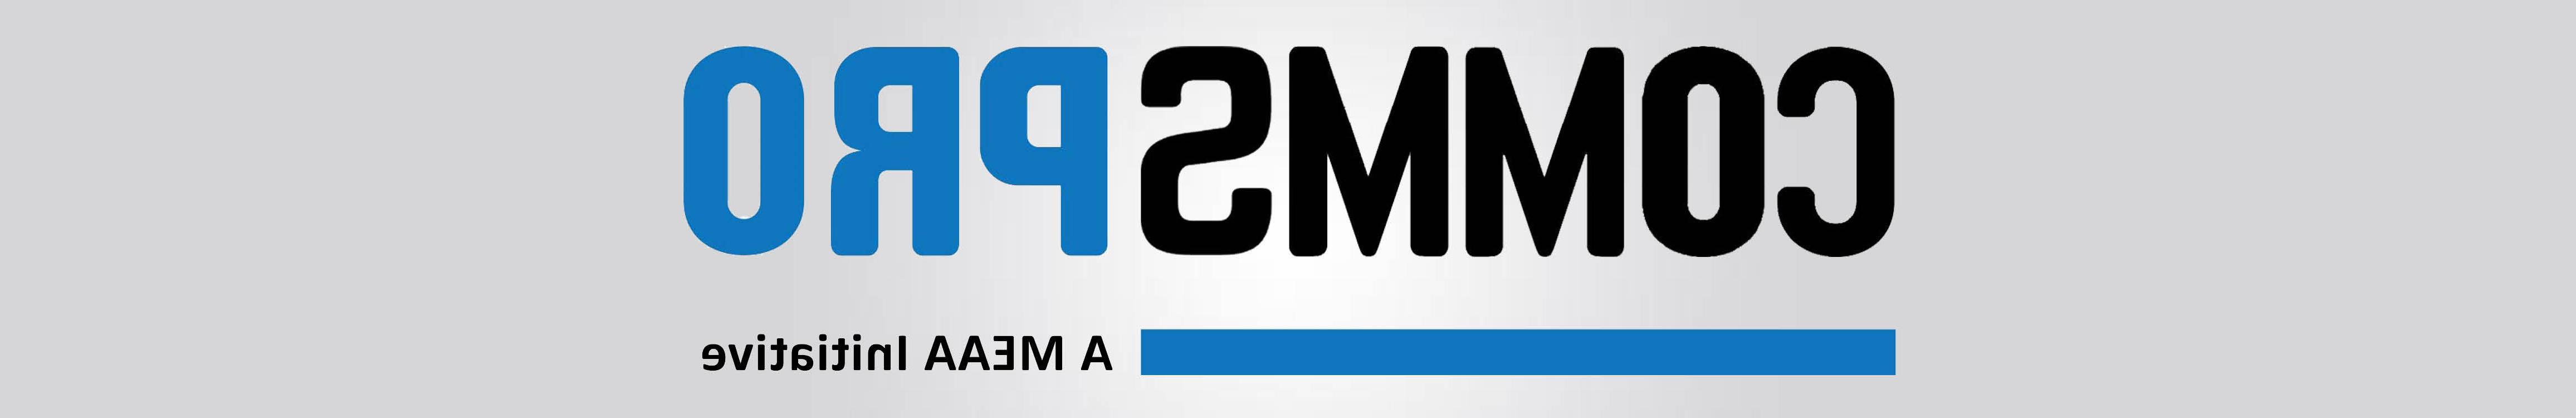 通讯亲MEAA倡议